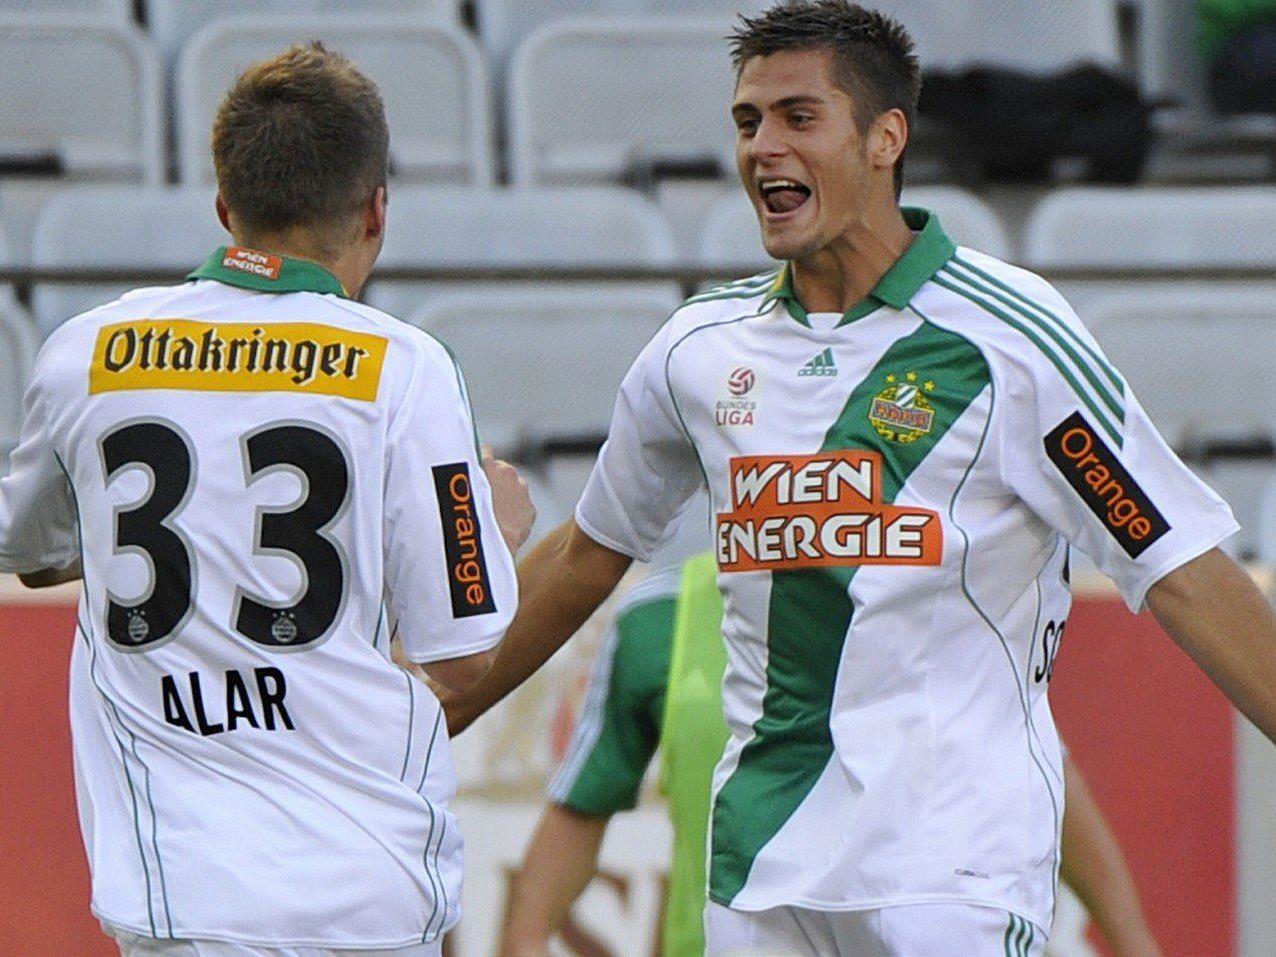 Michael Schimpelsberger verlängerte seinen Vertrag bei Rapid Wien bis 2016.